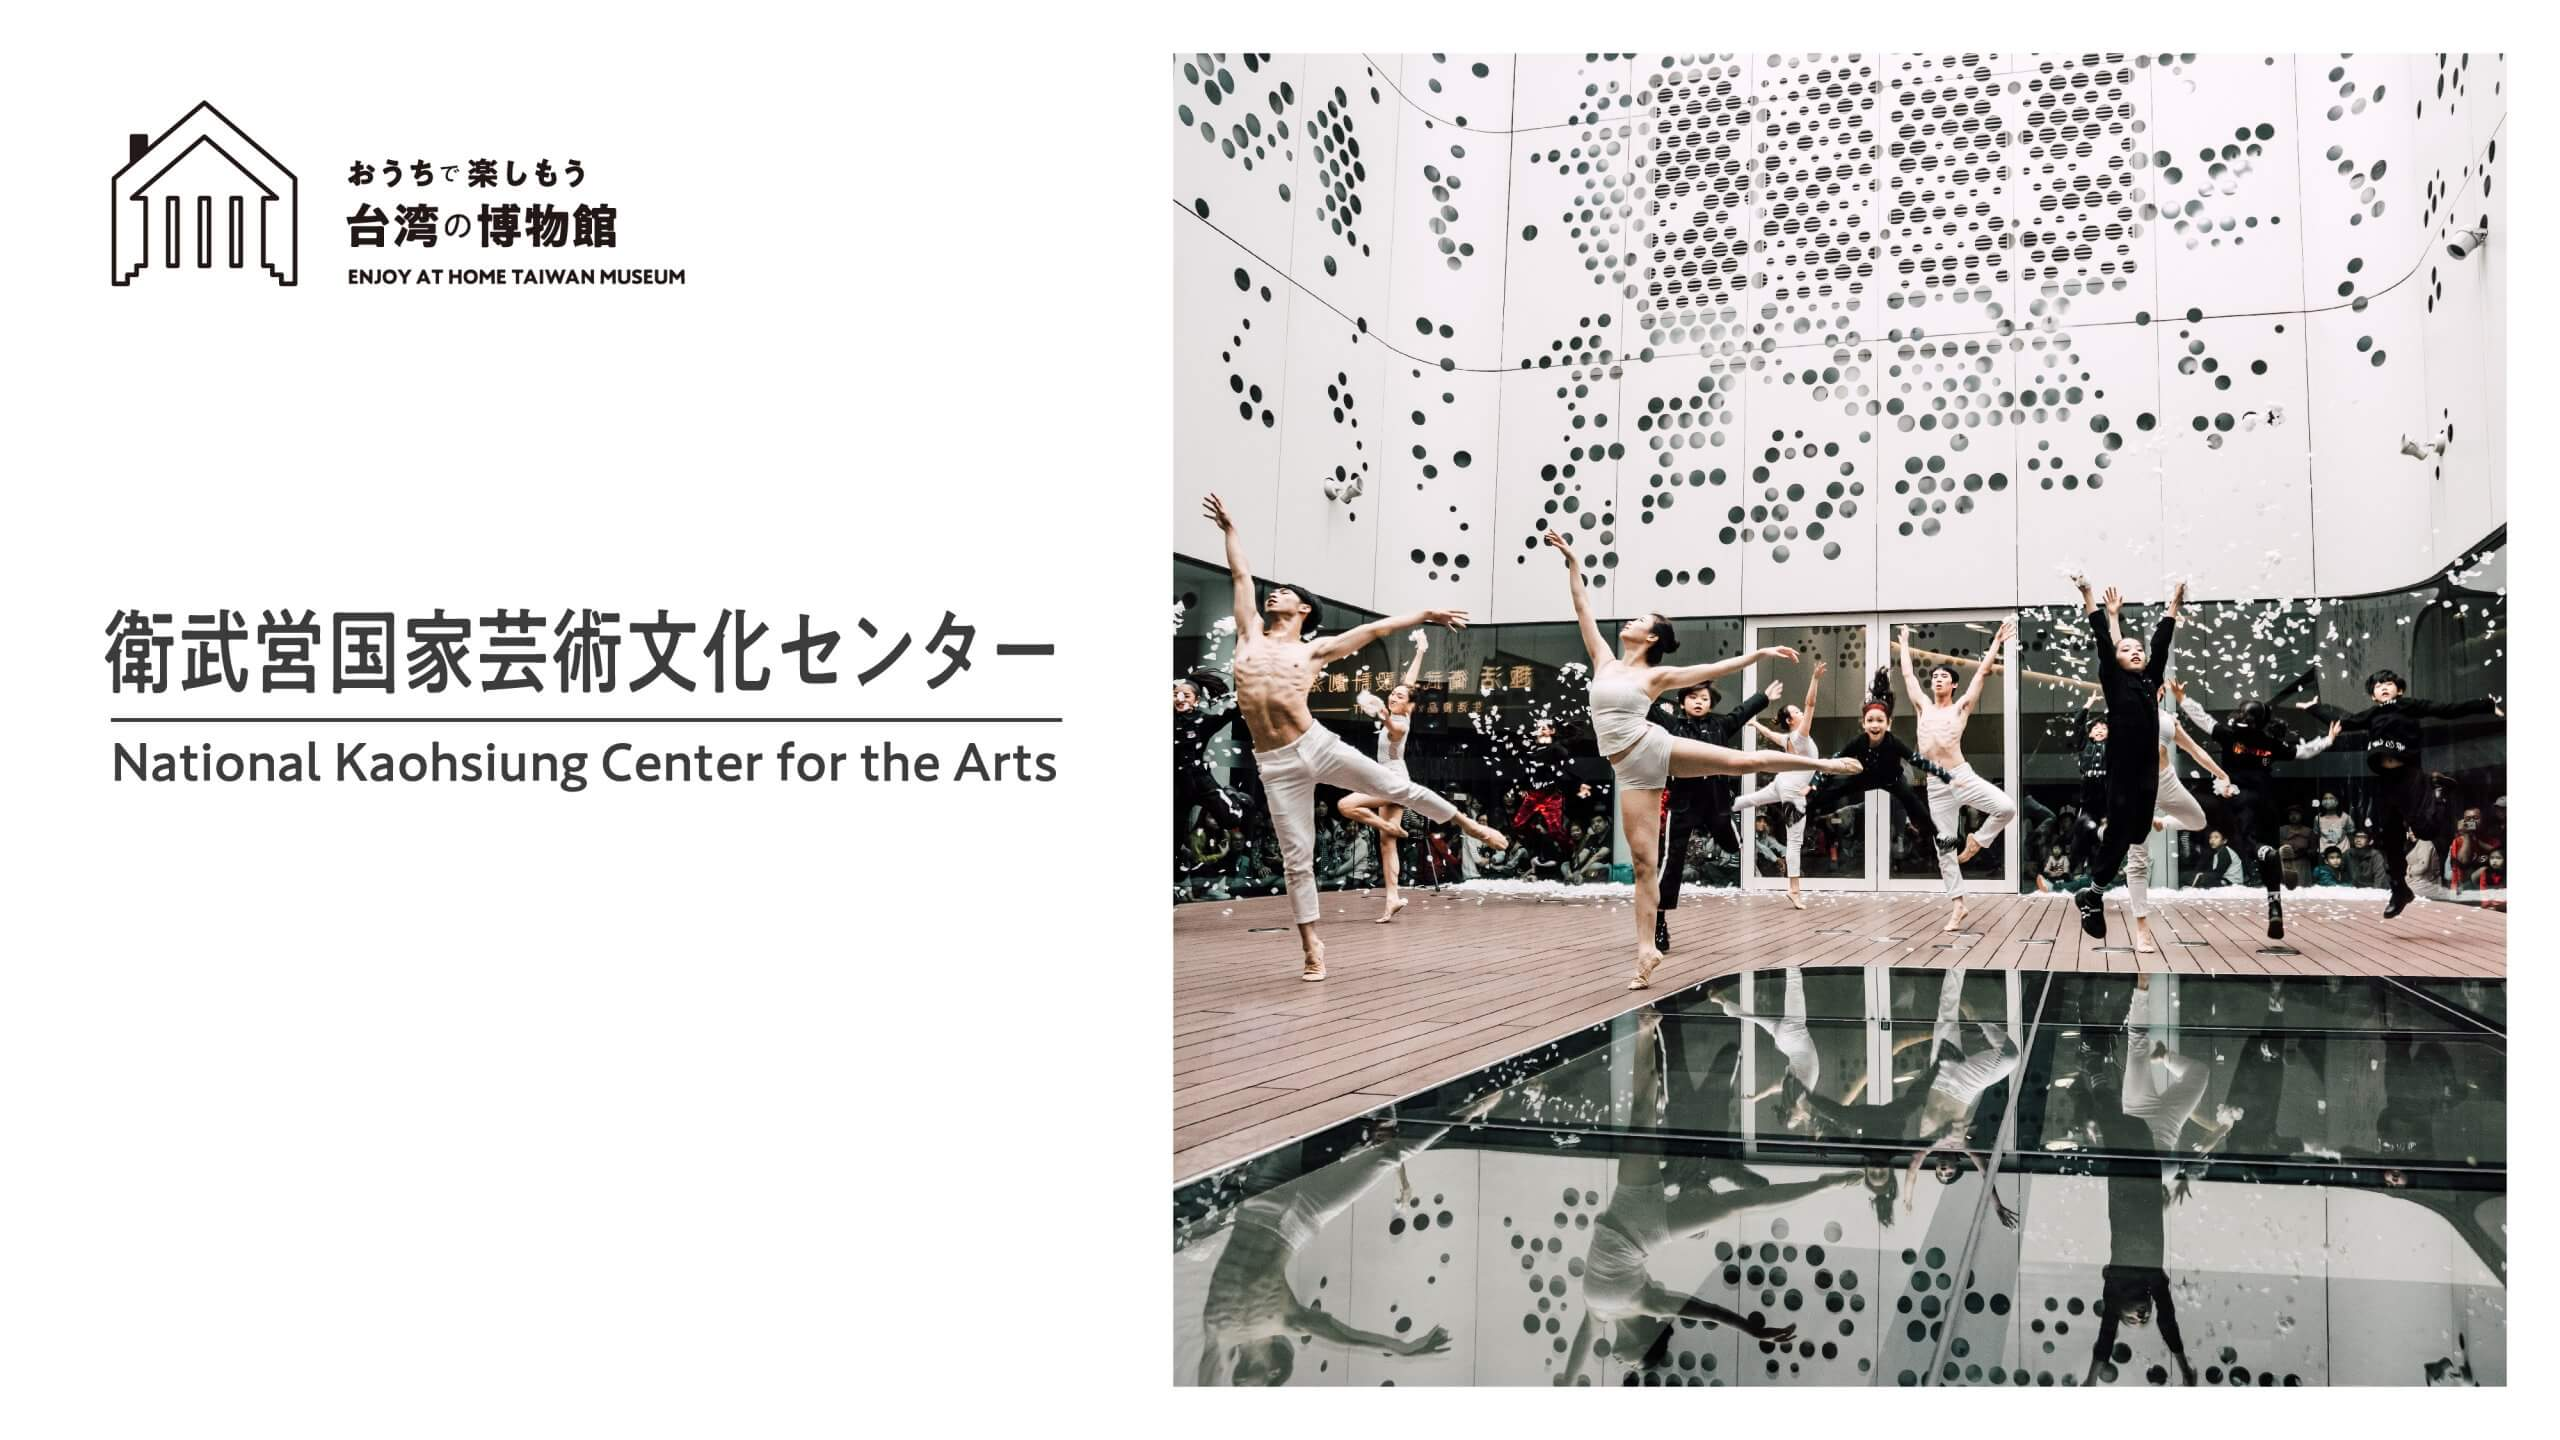 SNET台湾チャンネル『おうちで楽しもう台湾の博物館』第9回 衛武営国家芸術文化センター 配信